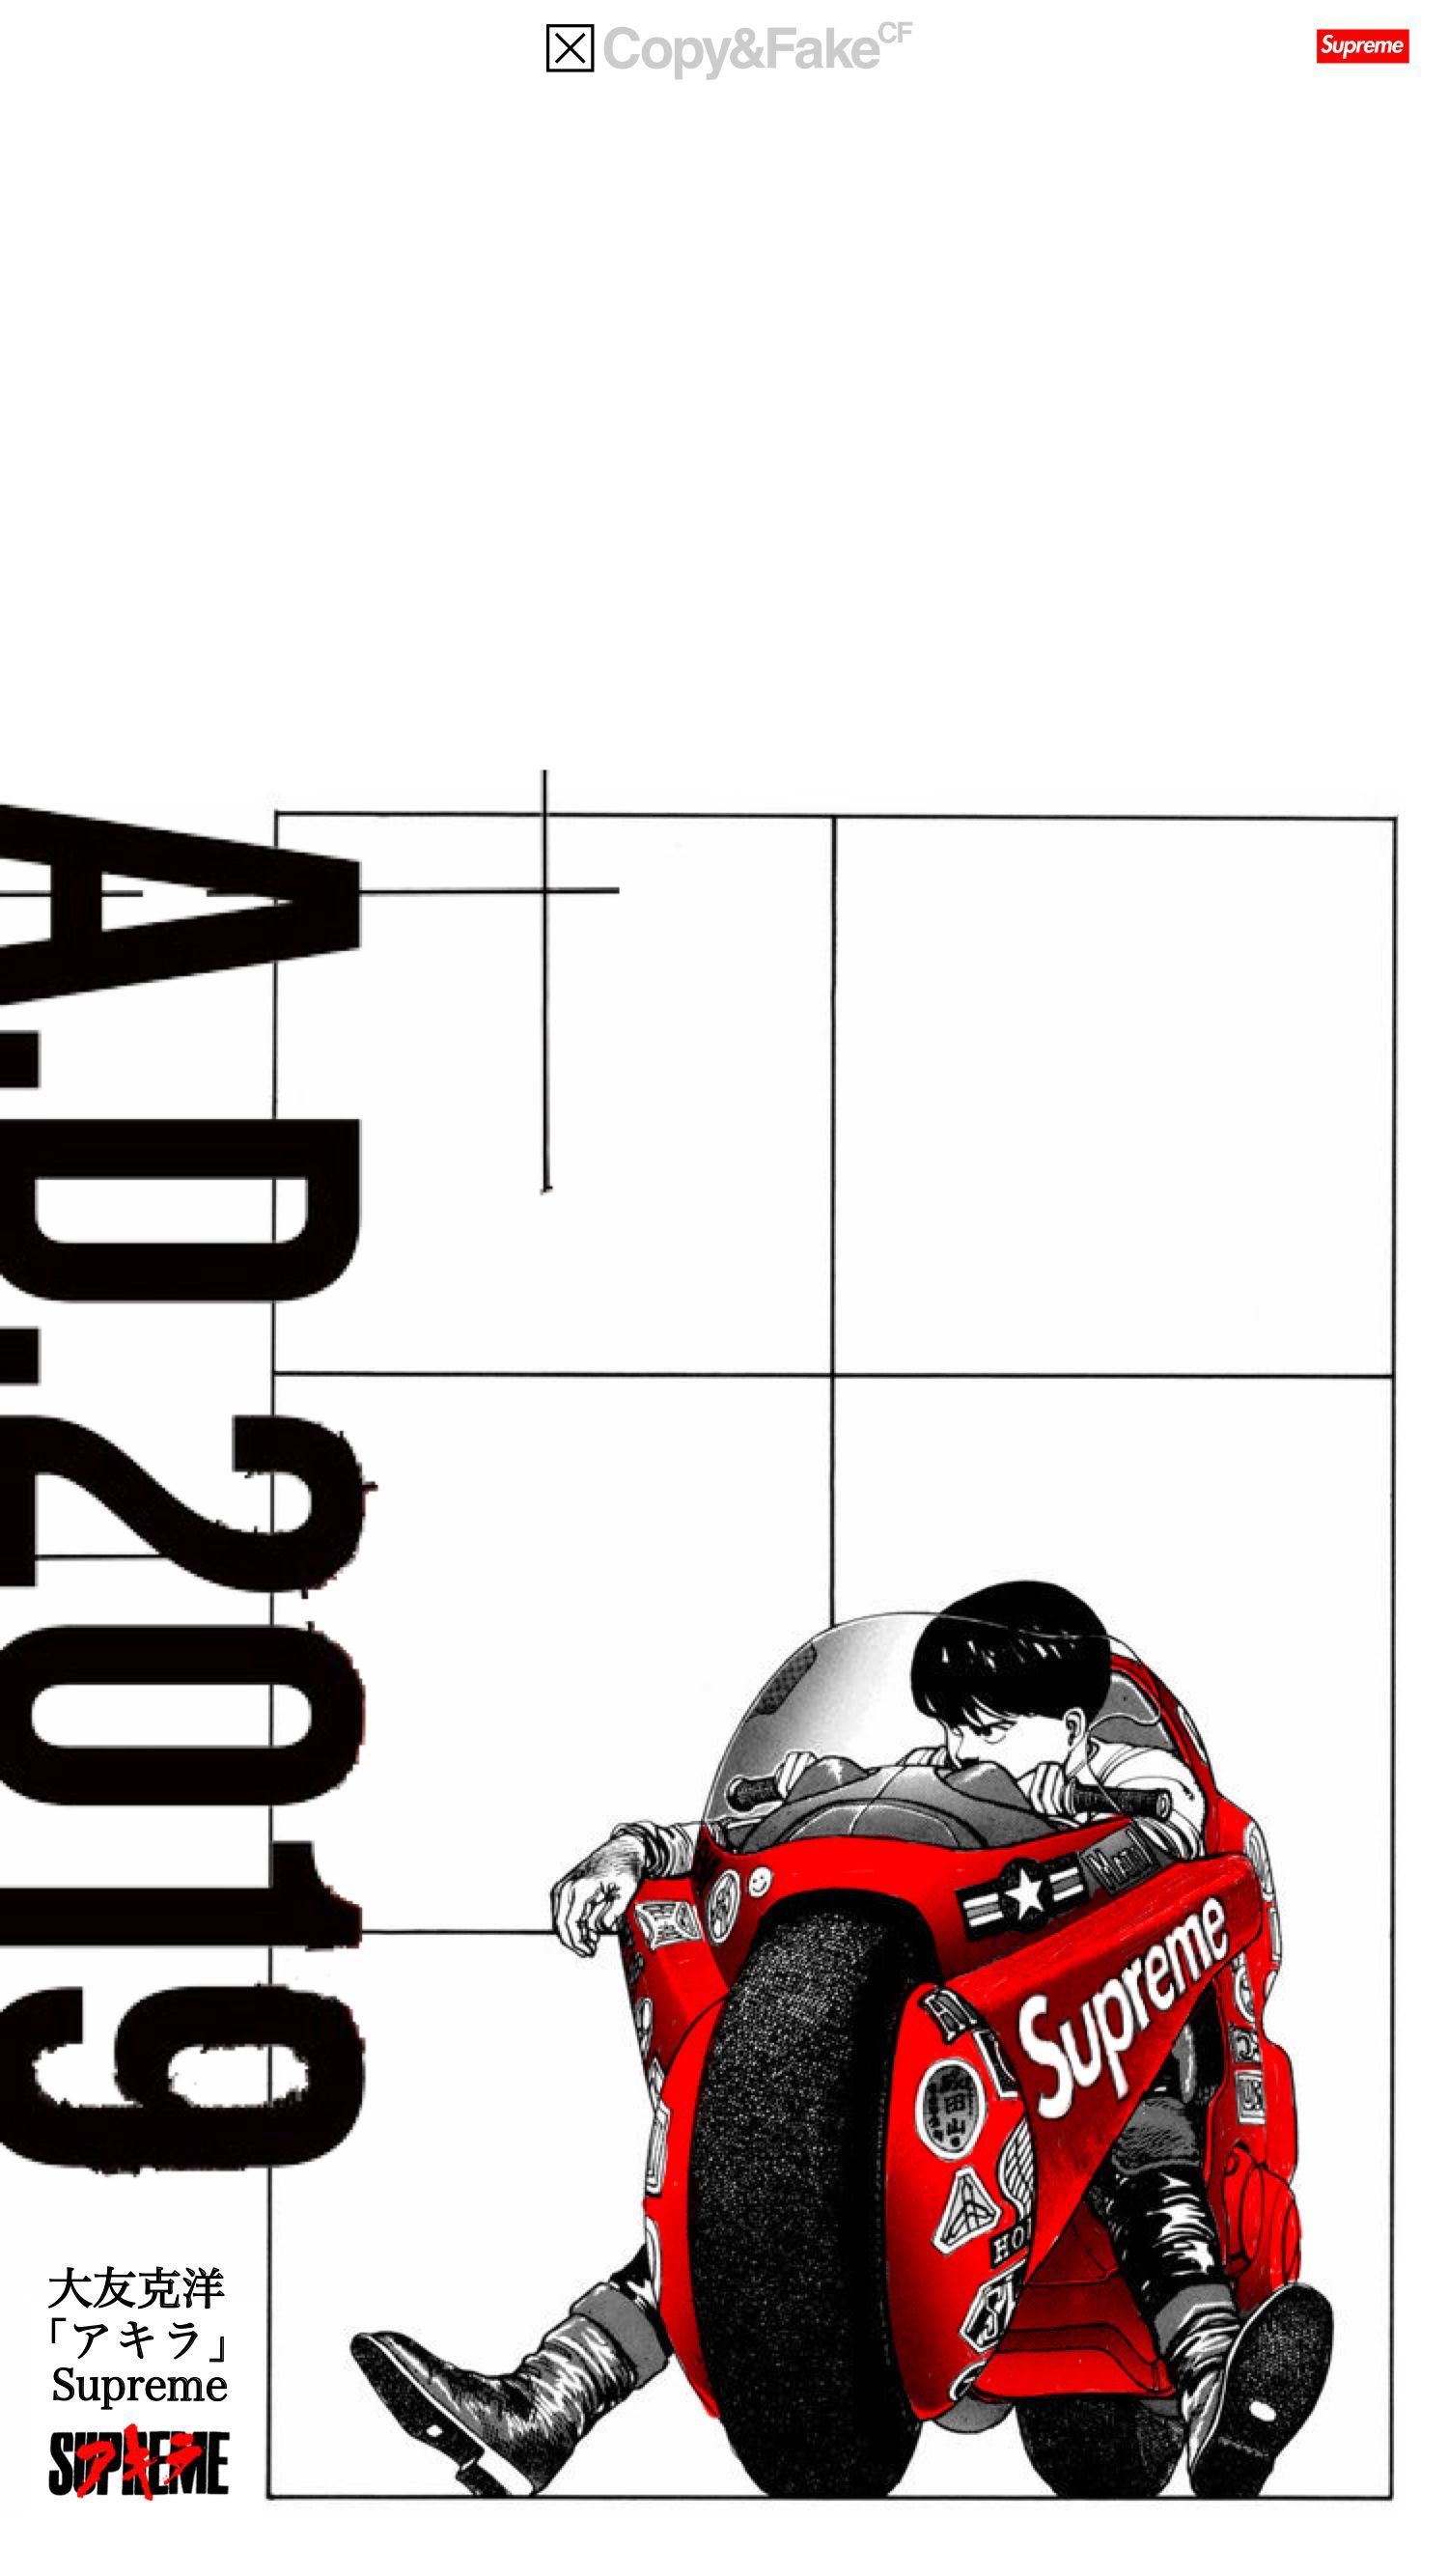 Supreme Akira Wallpaper Red Bike Ver Akira Red Bike Goku Wallpaper